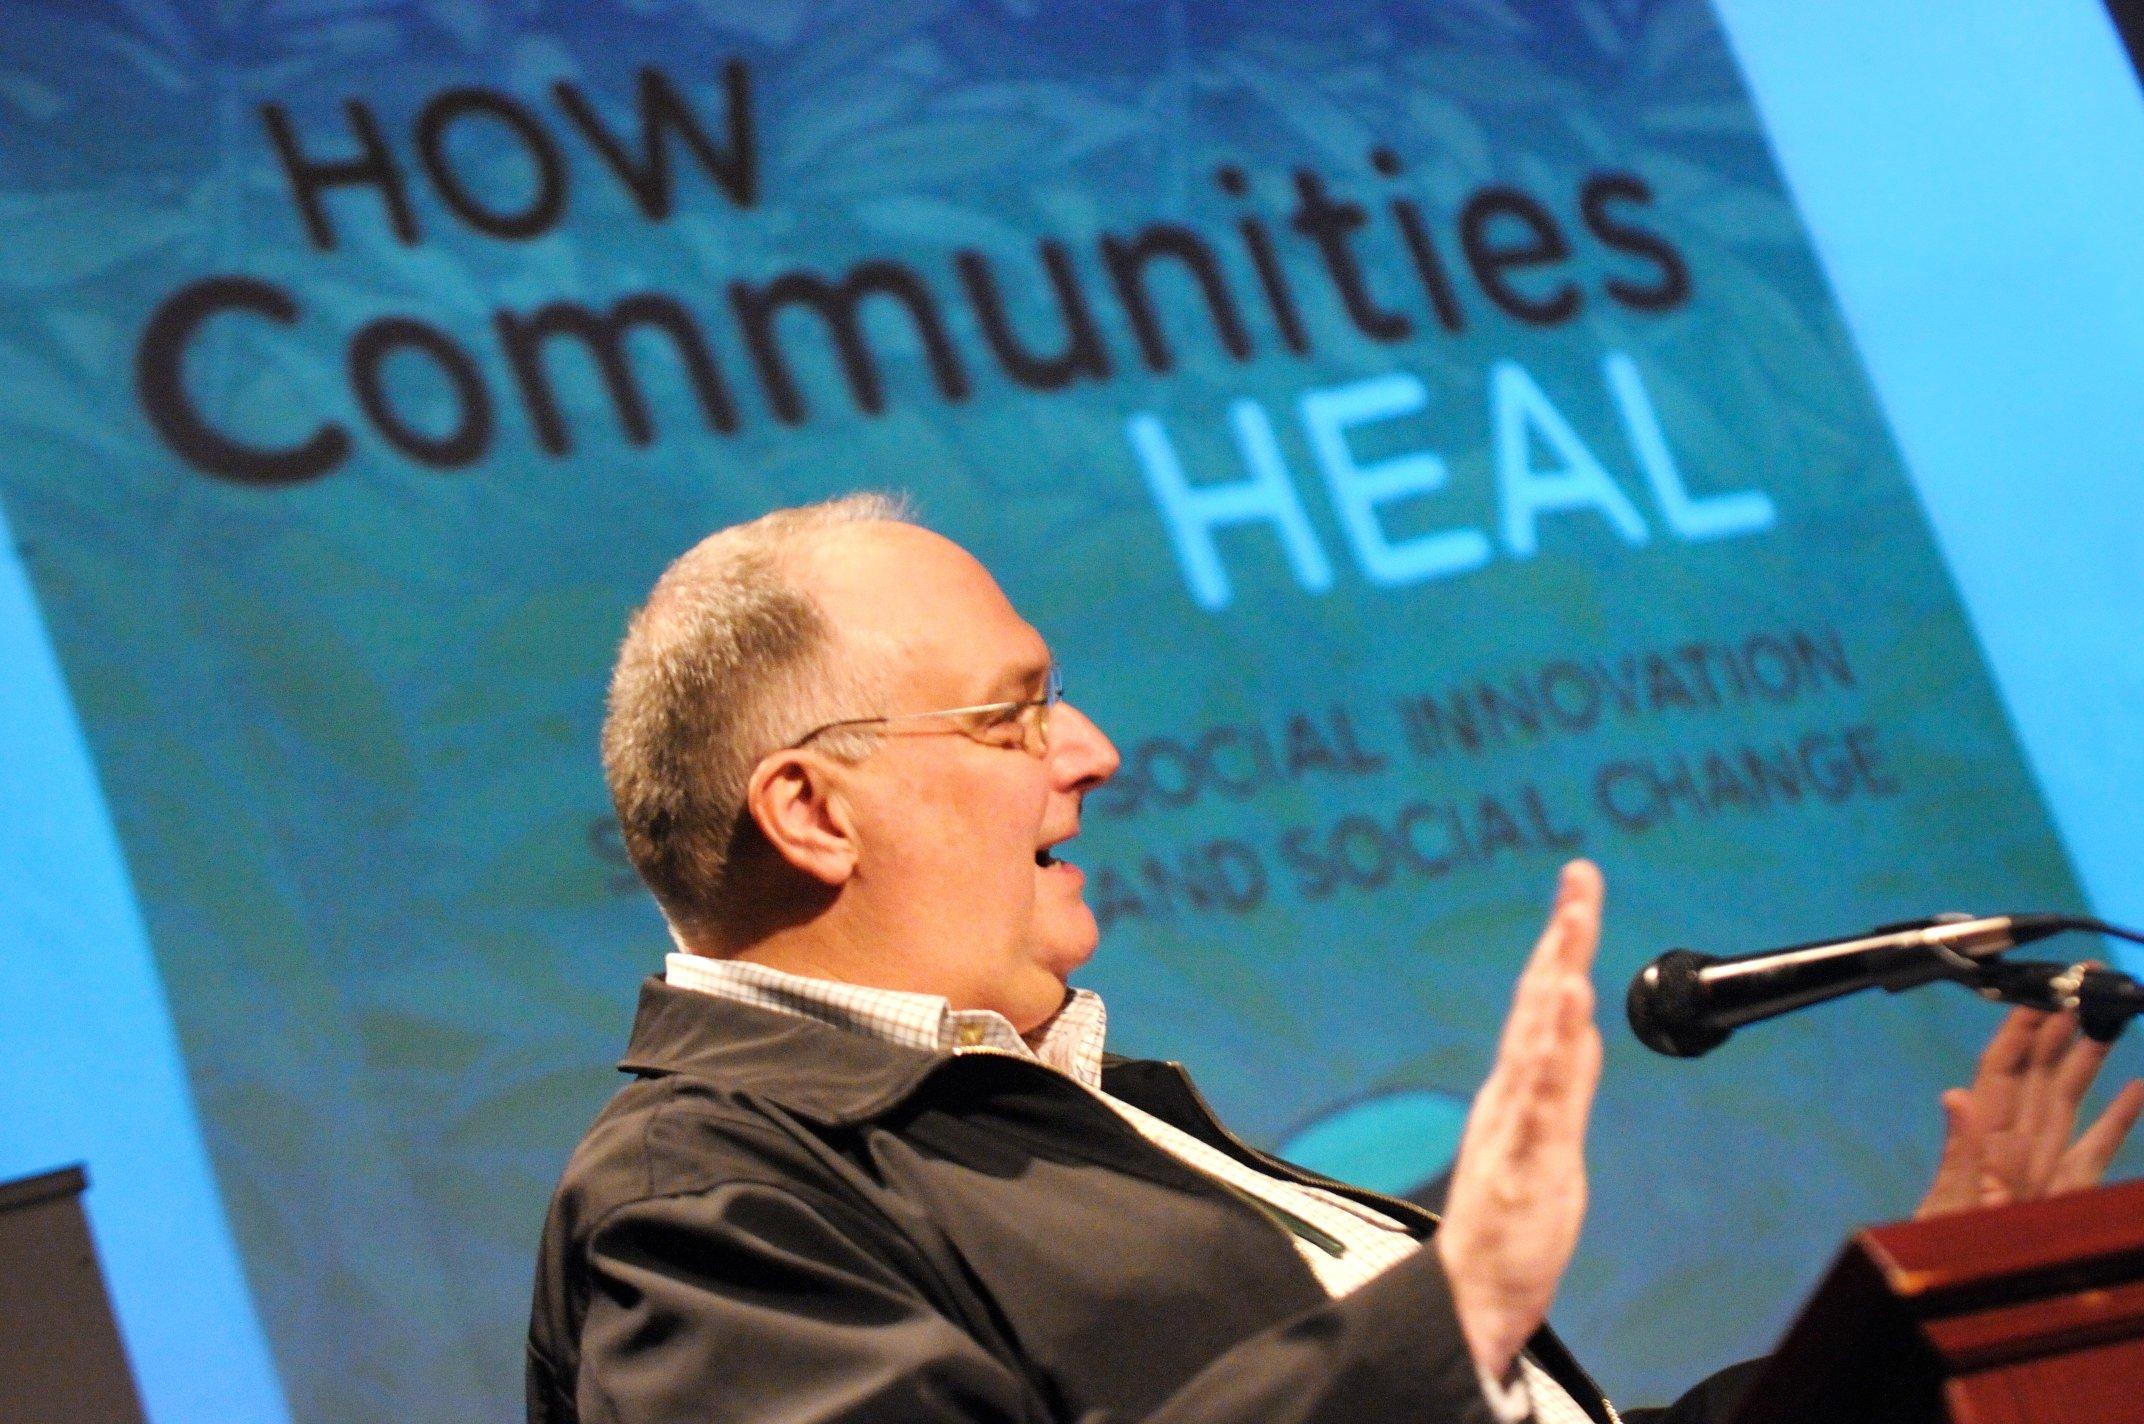 How_Communities_Heal_-_Wimmera_Volunteerfest_Horsham_Victoria_July_2012.jpg